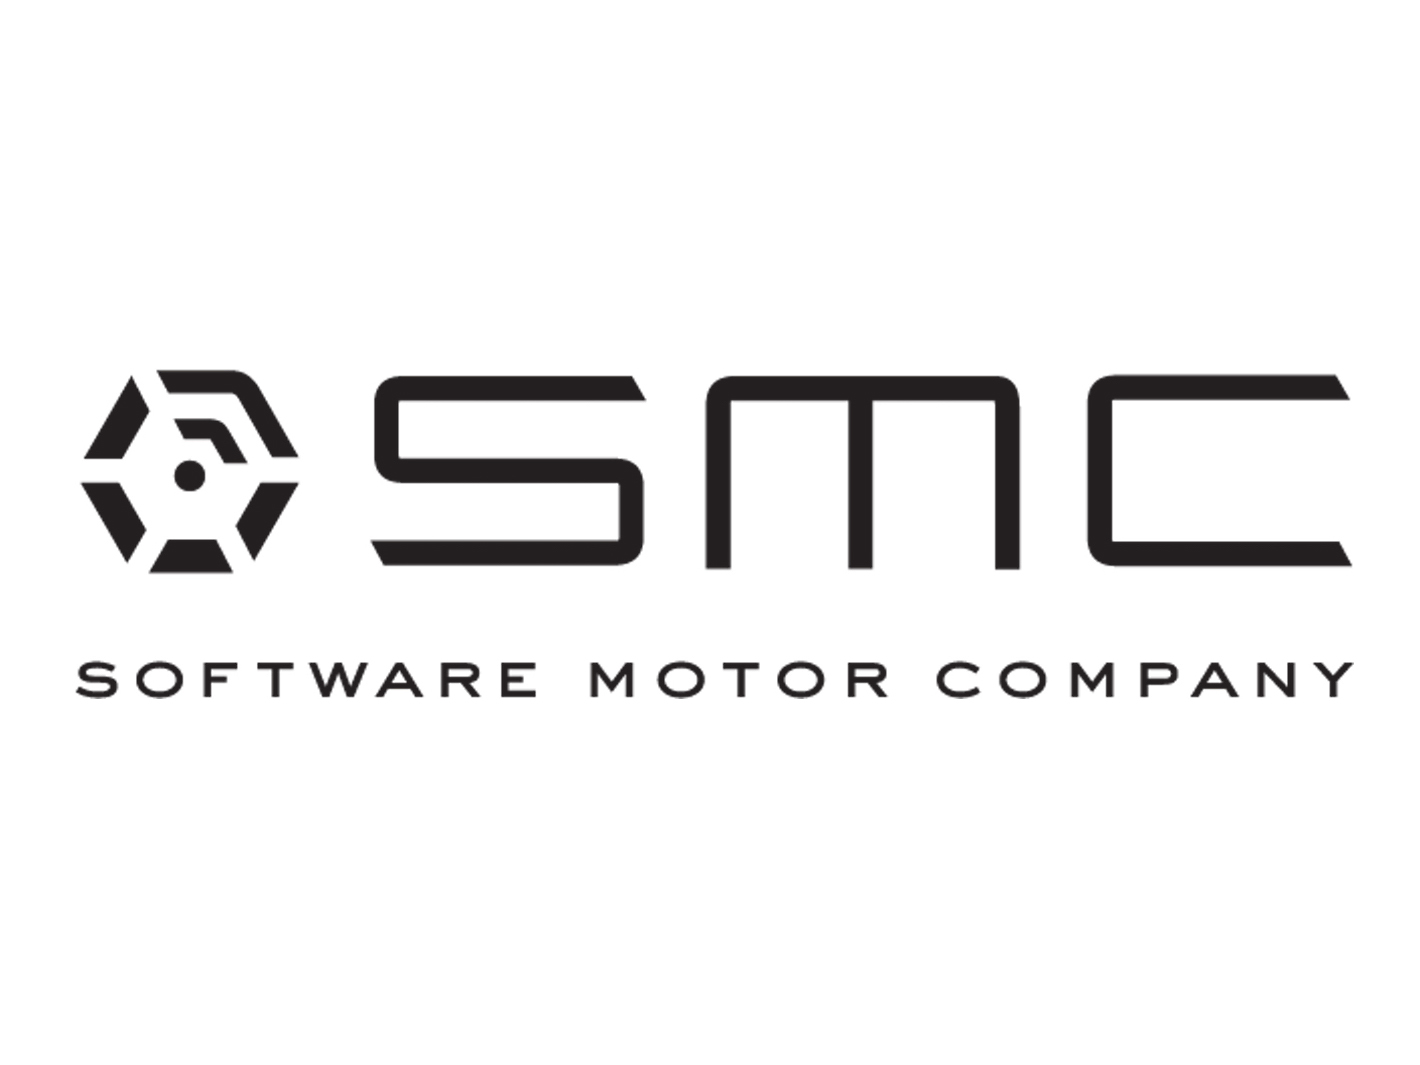 Software Motor Corporation 2018.jpg